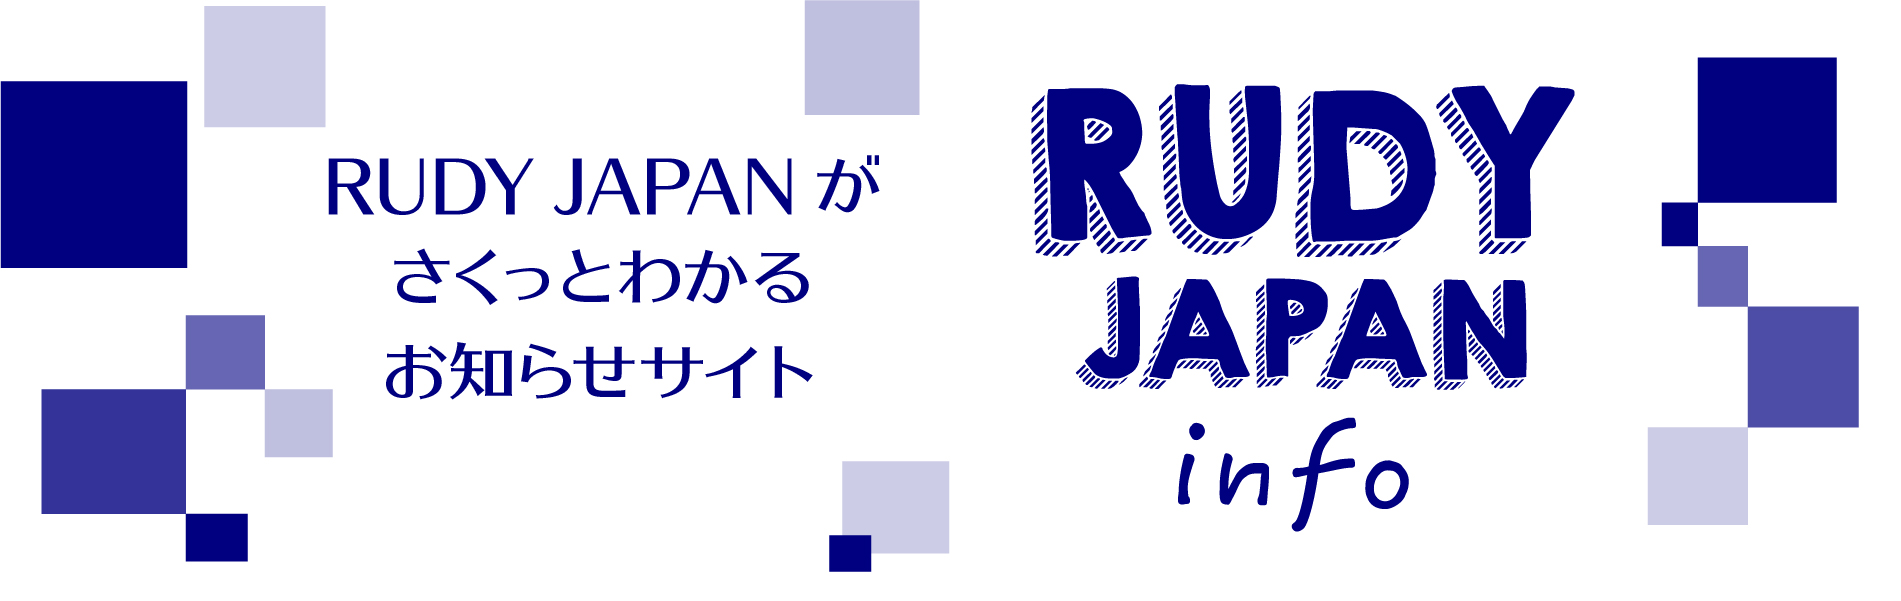 "RUDY JAPAN お知らせサイト""RUDY JAPAN info"""